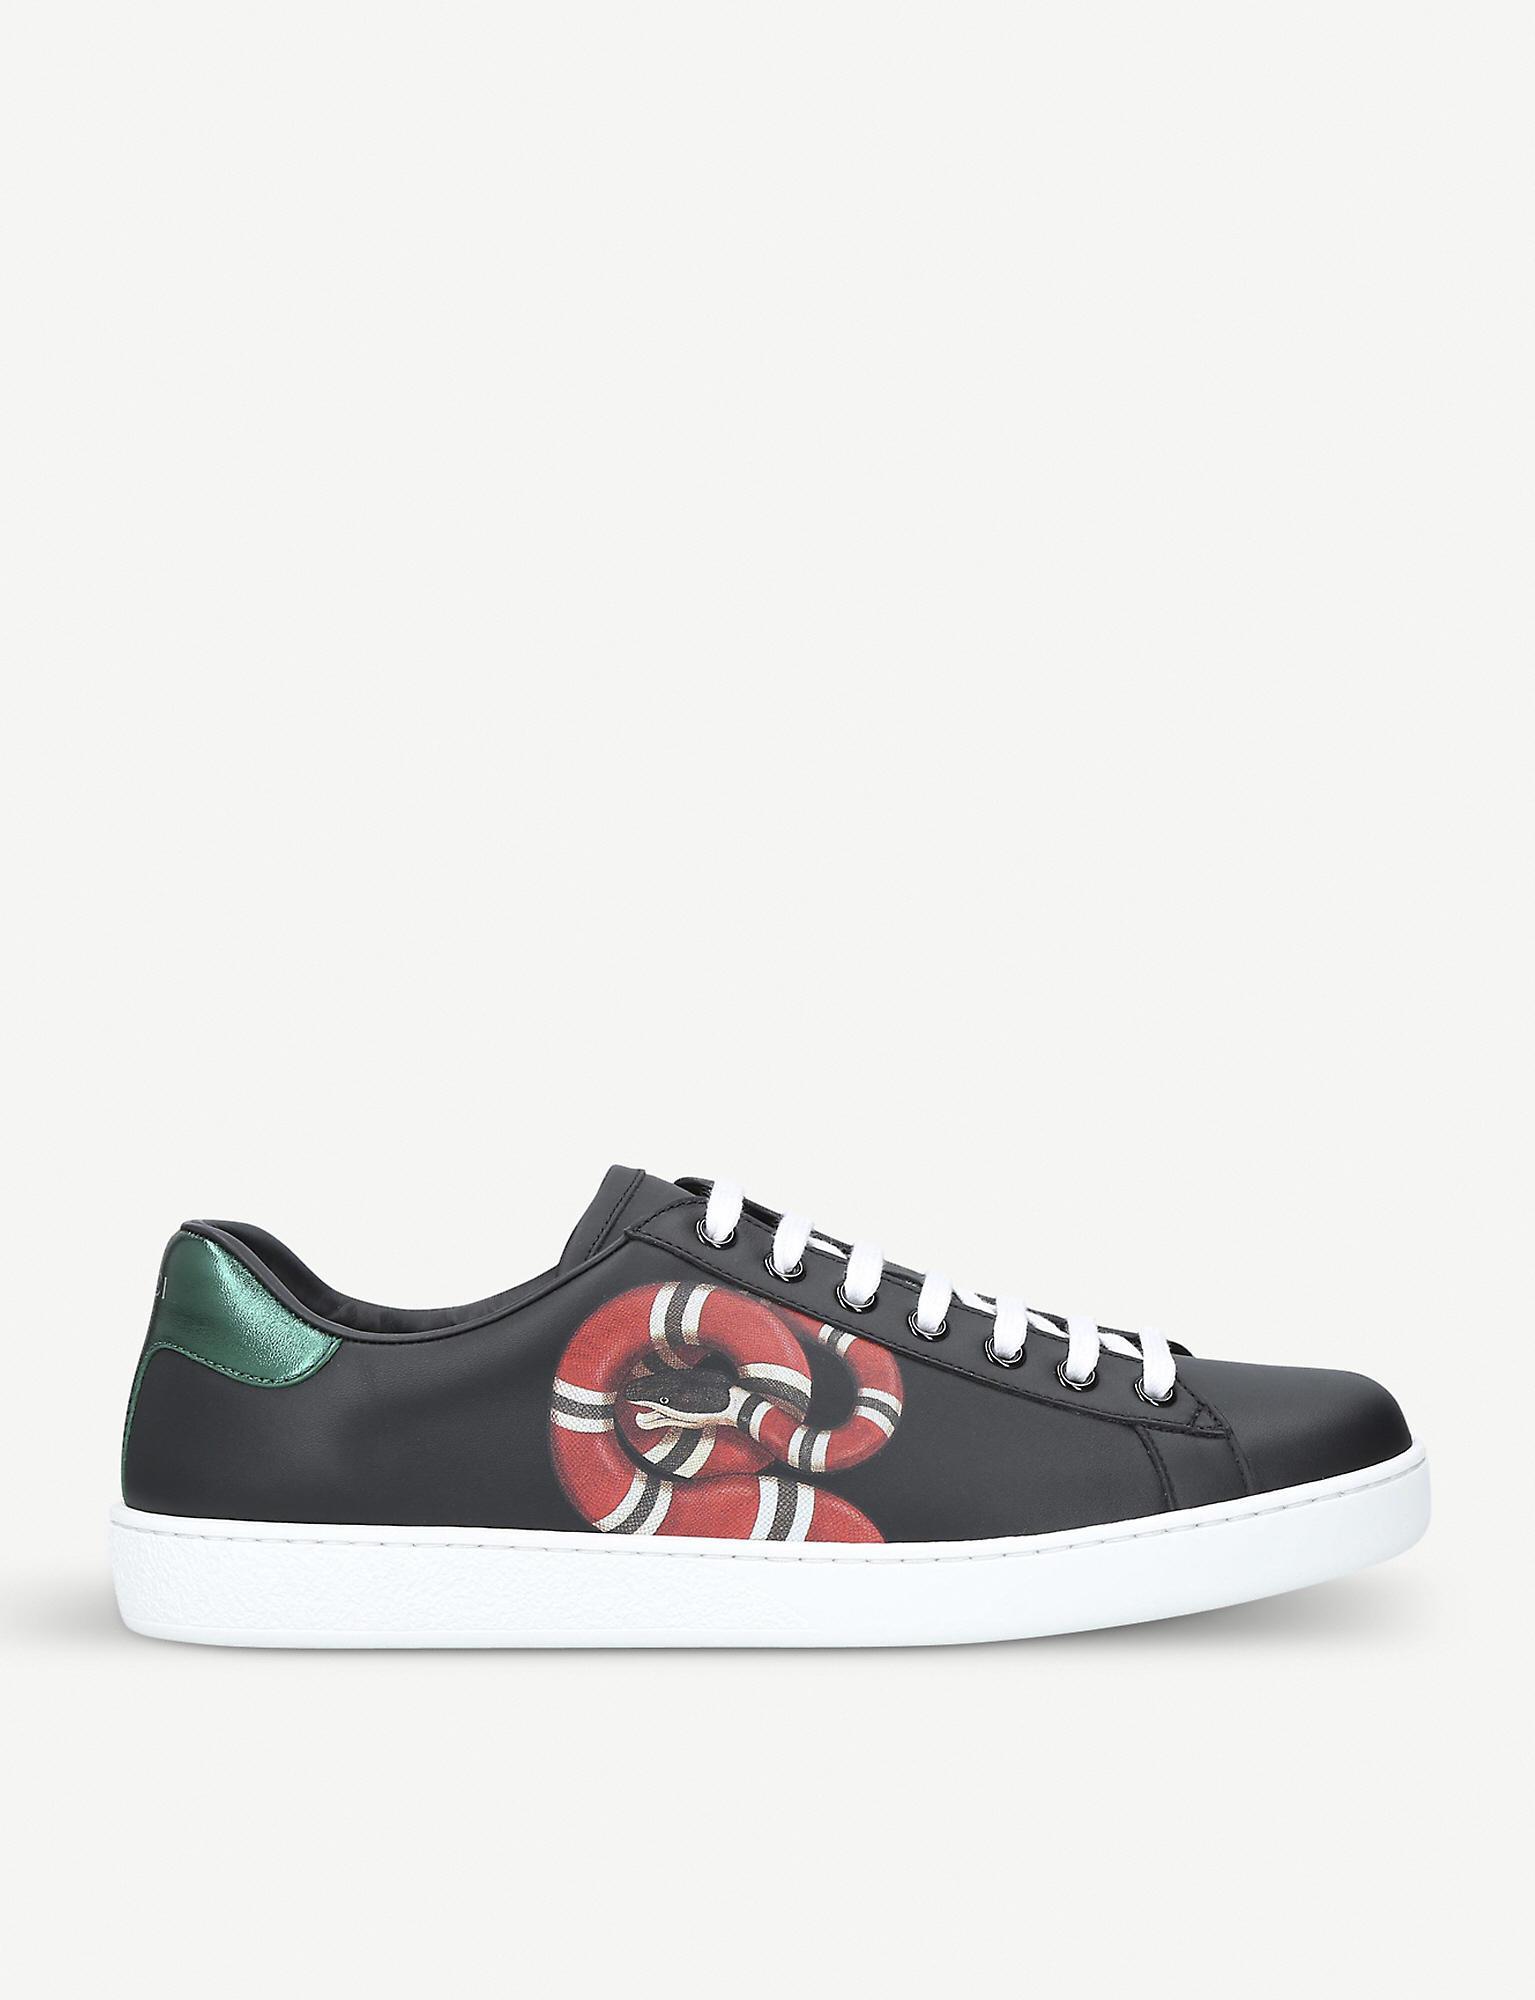 Parity \u003e gucci black shoes with snake